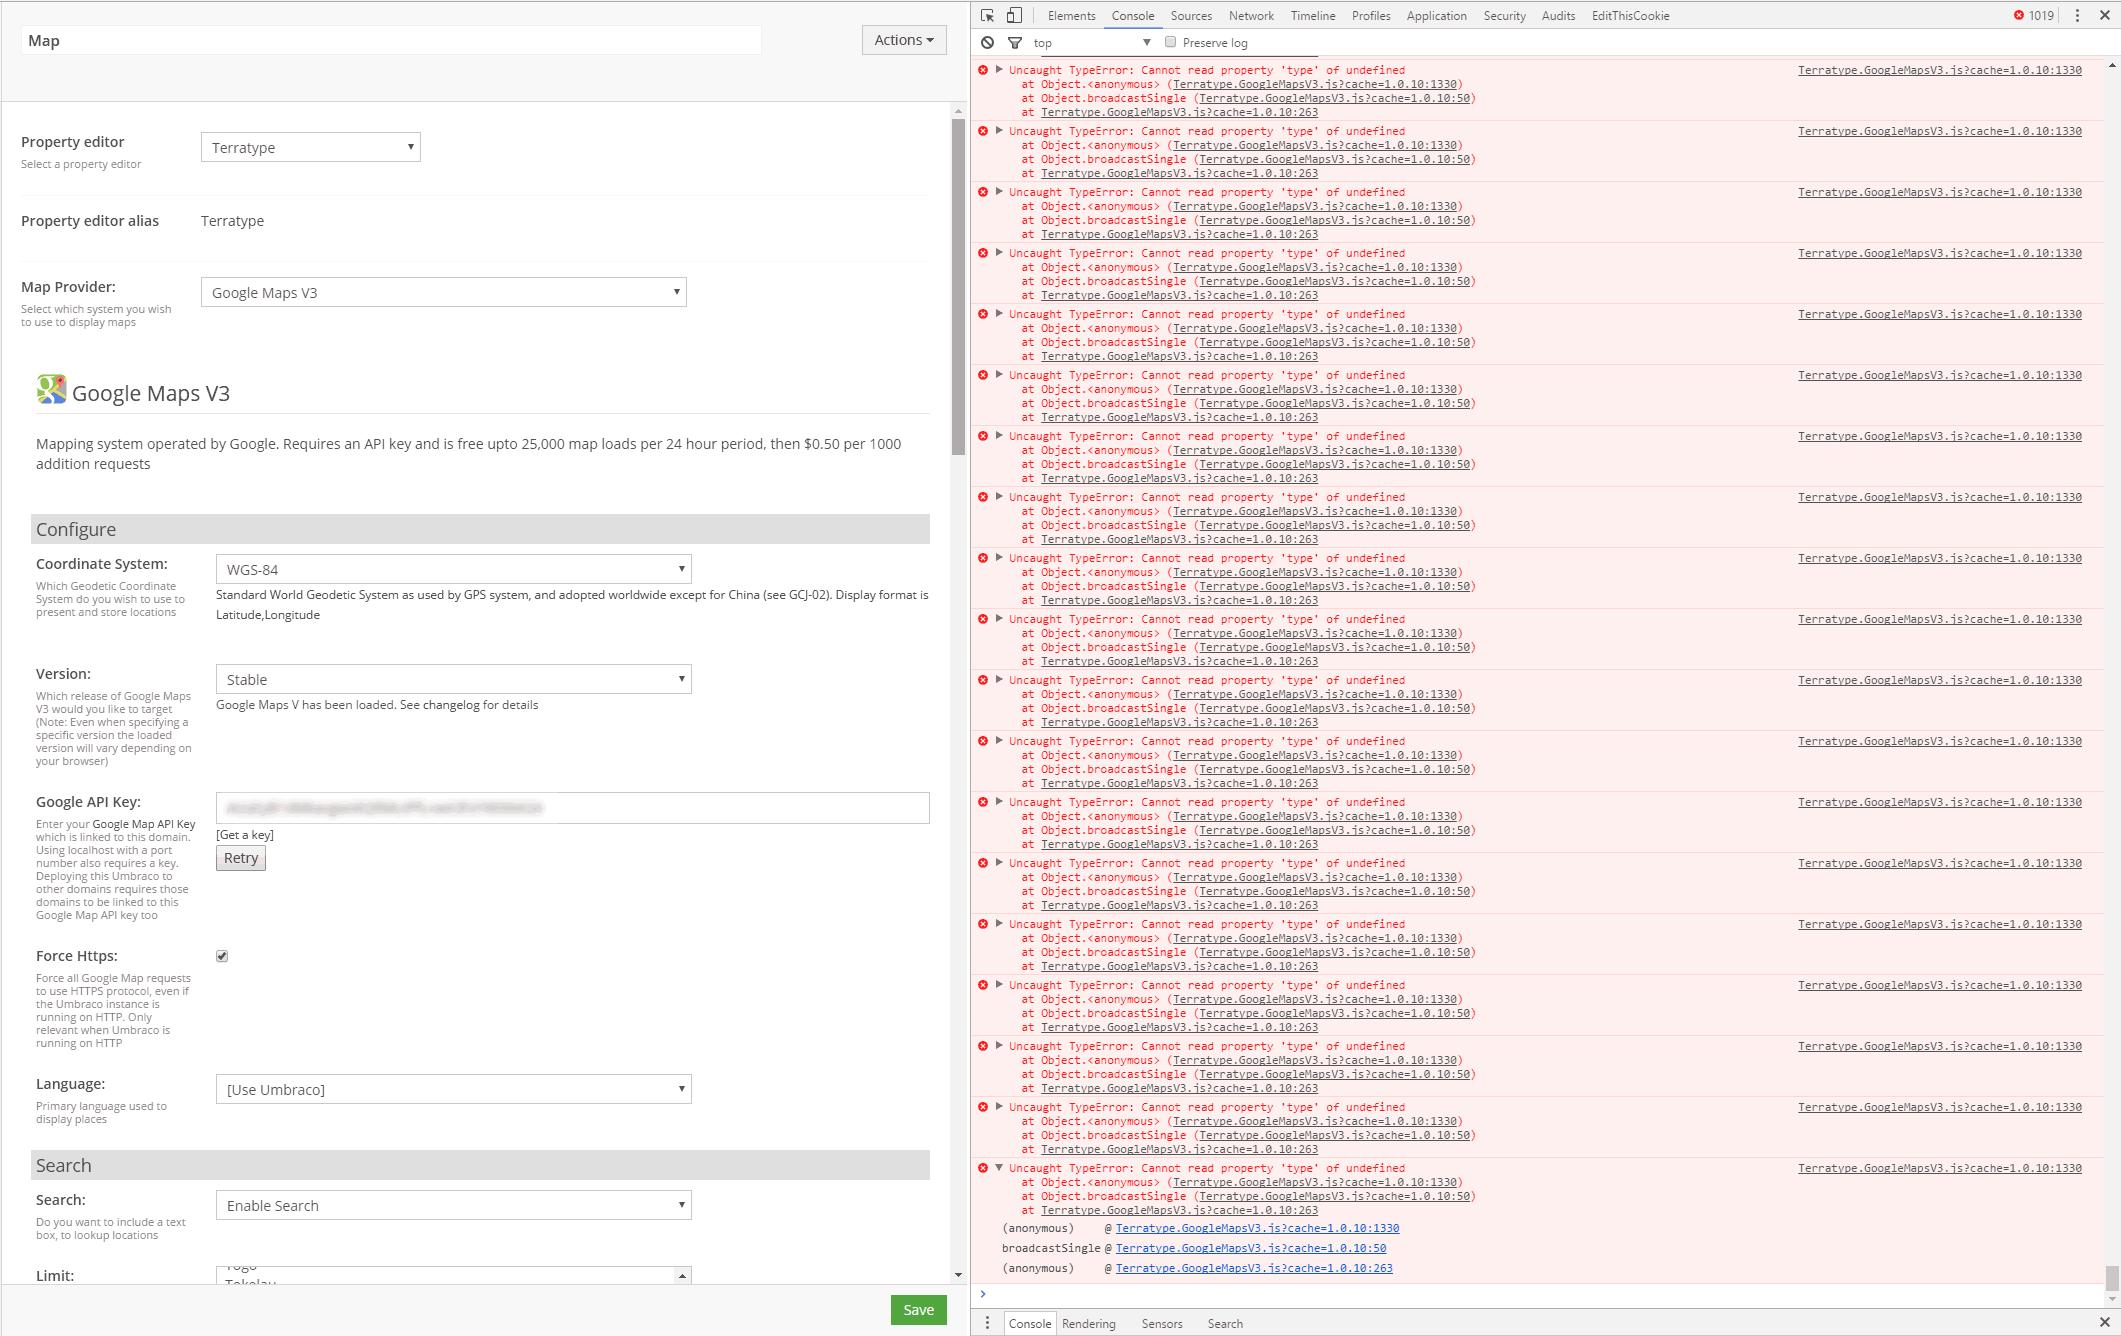 terratype map not rendering console errors - Bugs